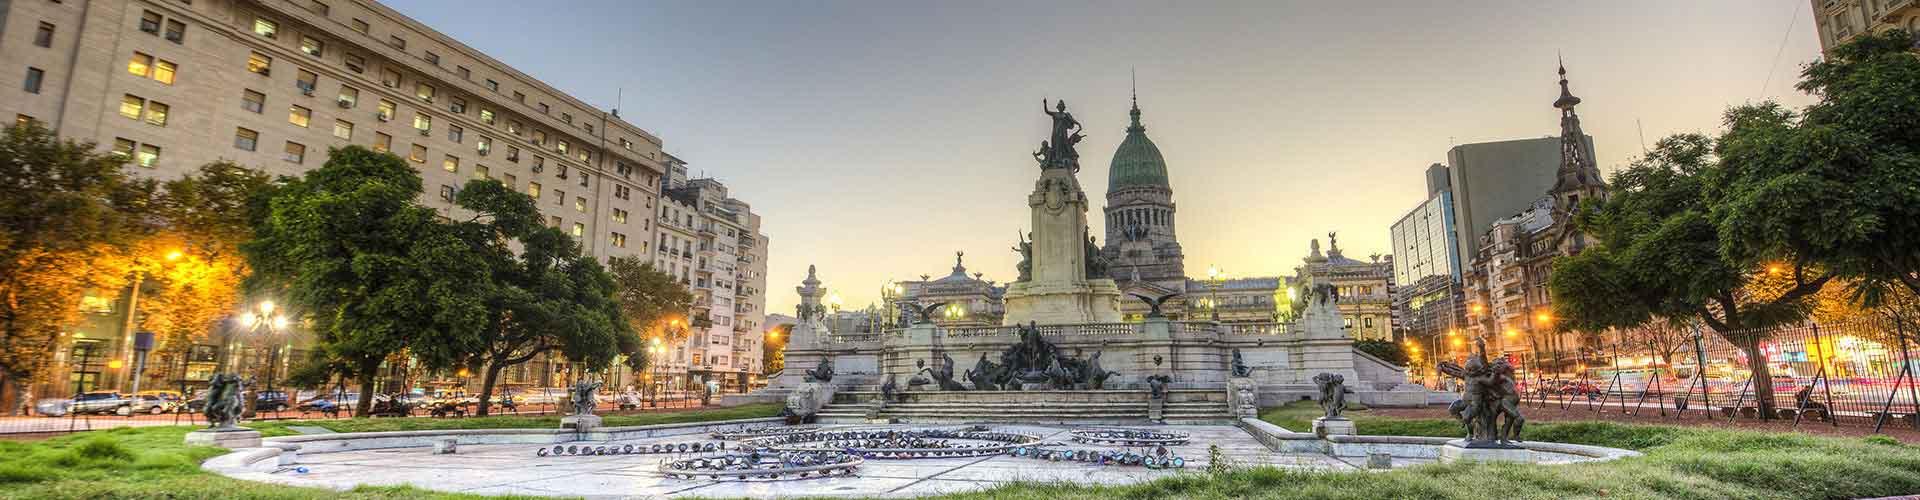 Buenos Aires - Hoteles baratos cerca a Estación de tren de Retiro. Mapas de Buenos Aires, Fotos y comentarios de cada Hotel en Buenos Aires.